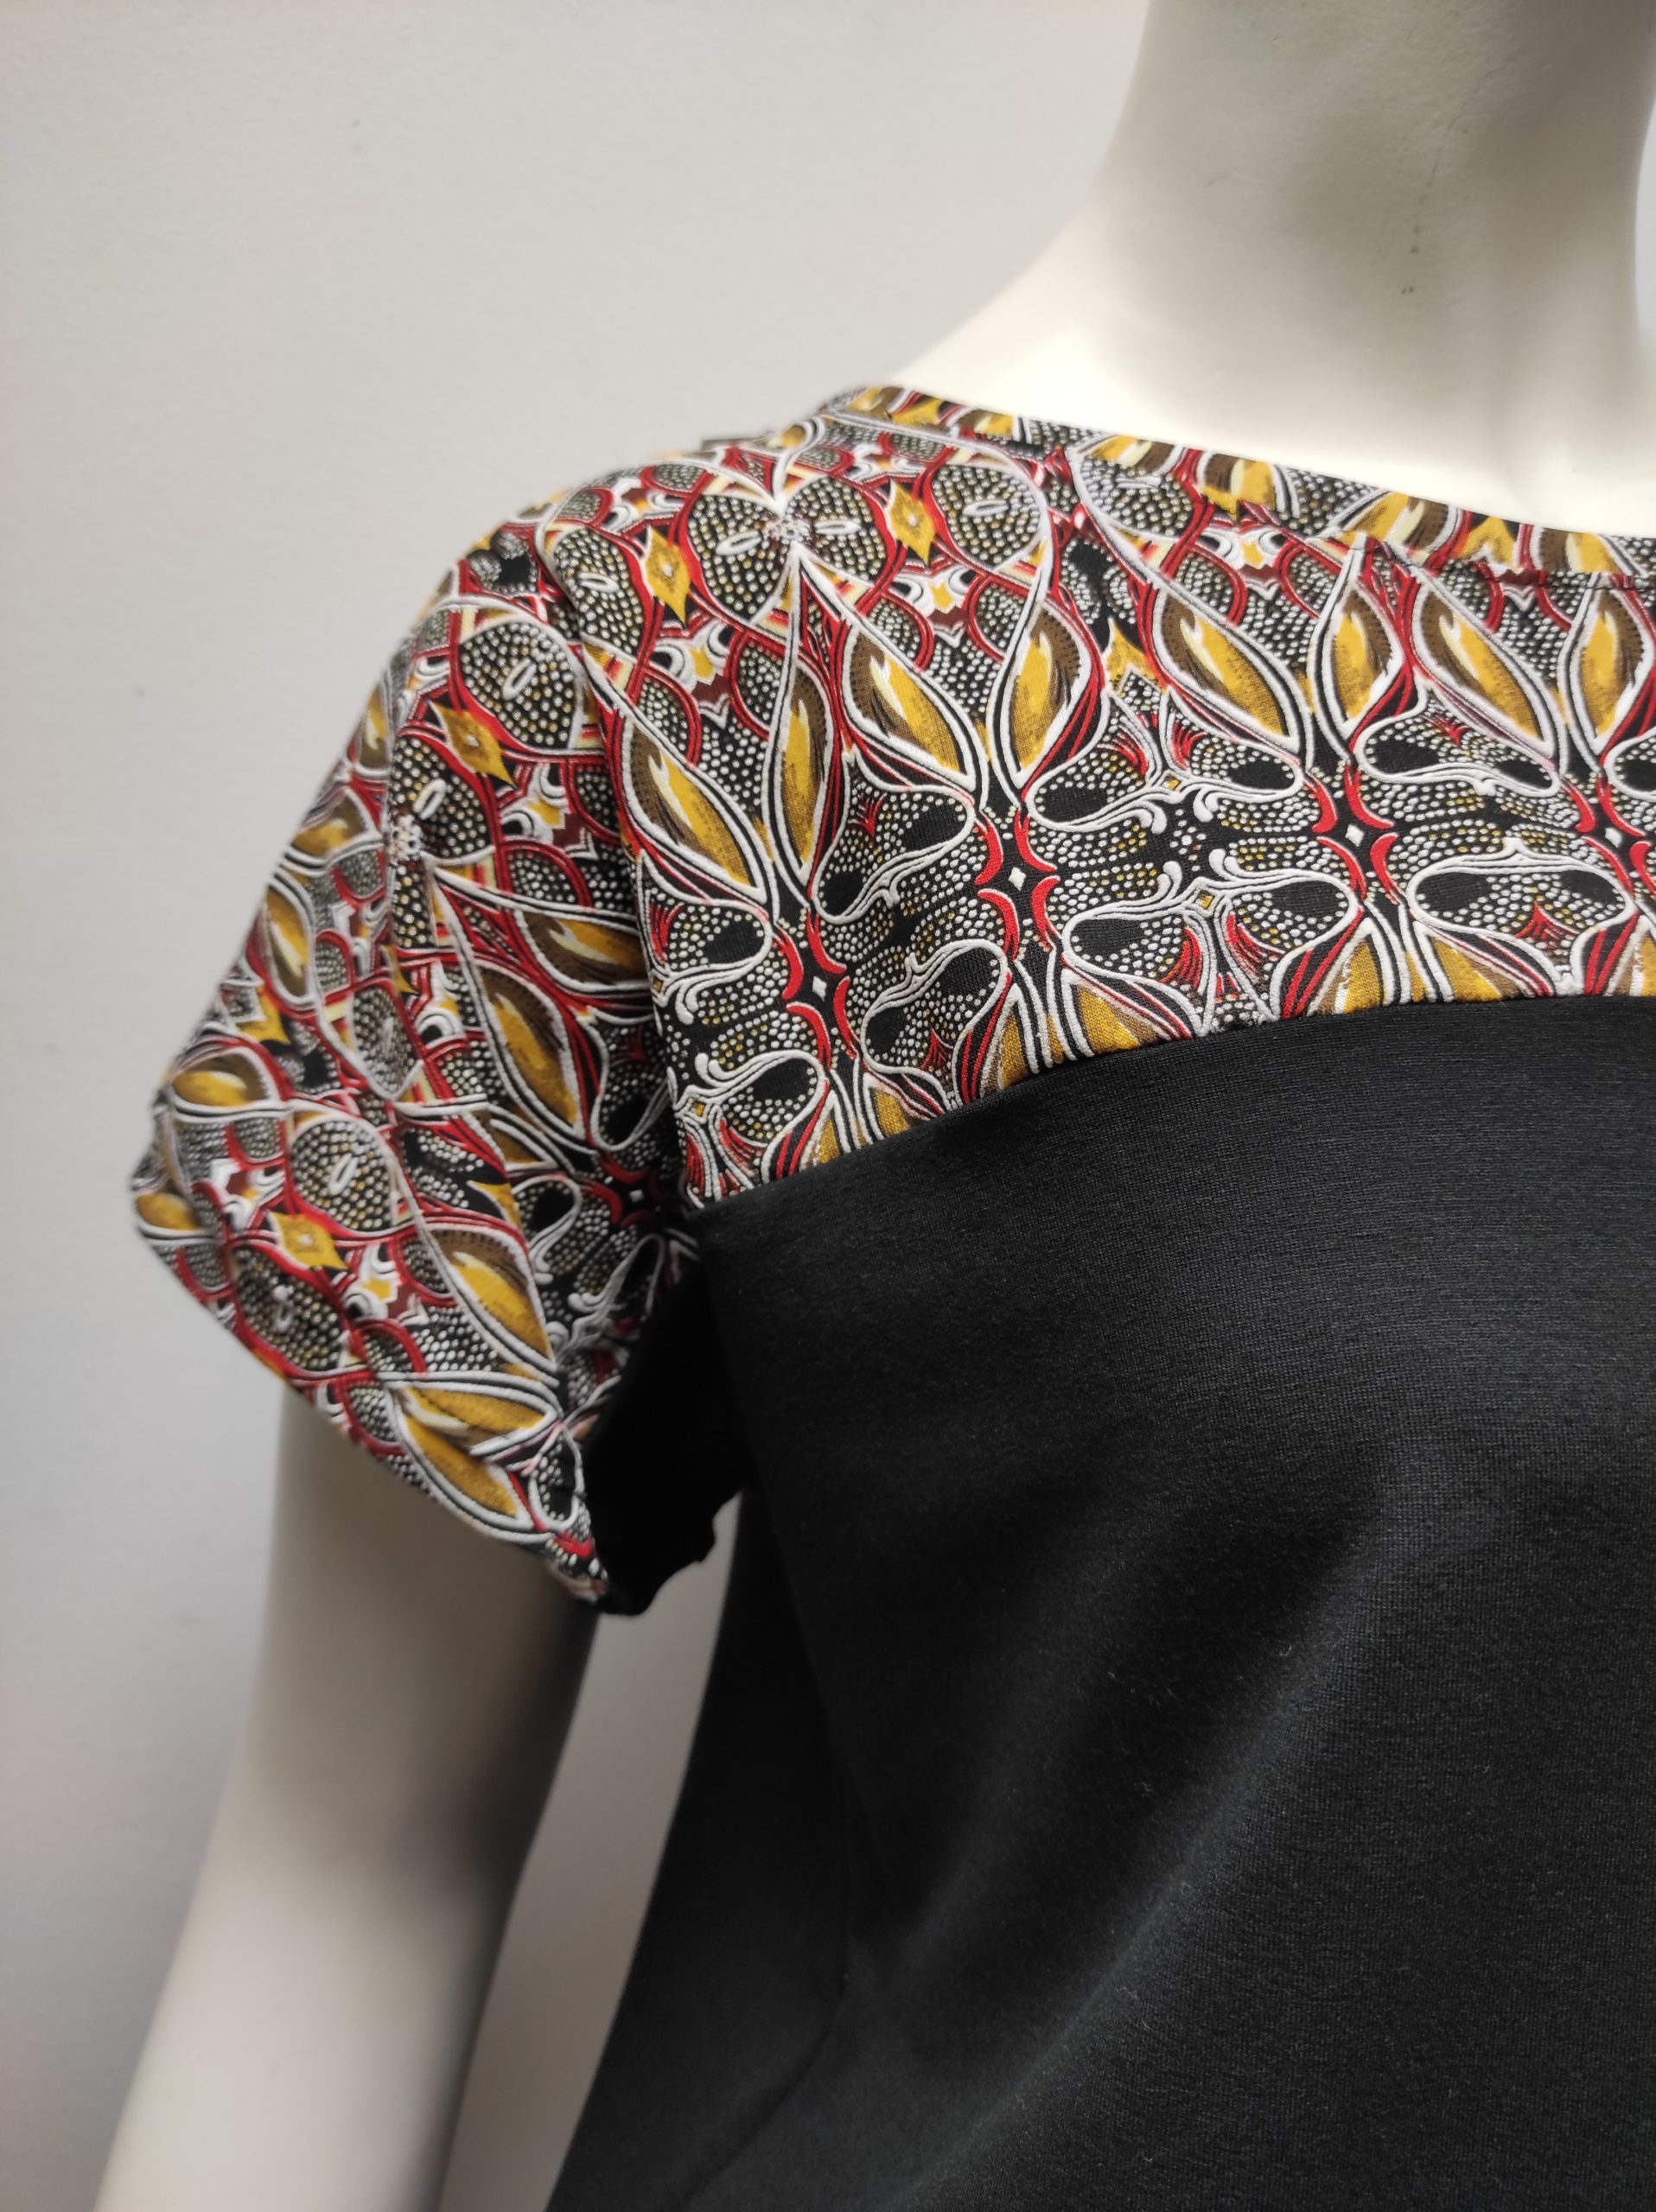 T-Shirt Kani KaléidoNoir Julie Bonnard Créatrice Saint-Étienne (7)